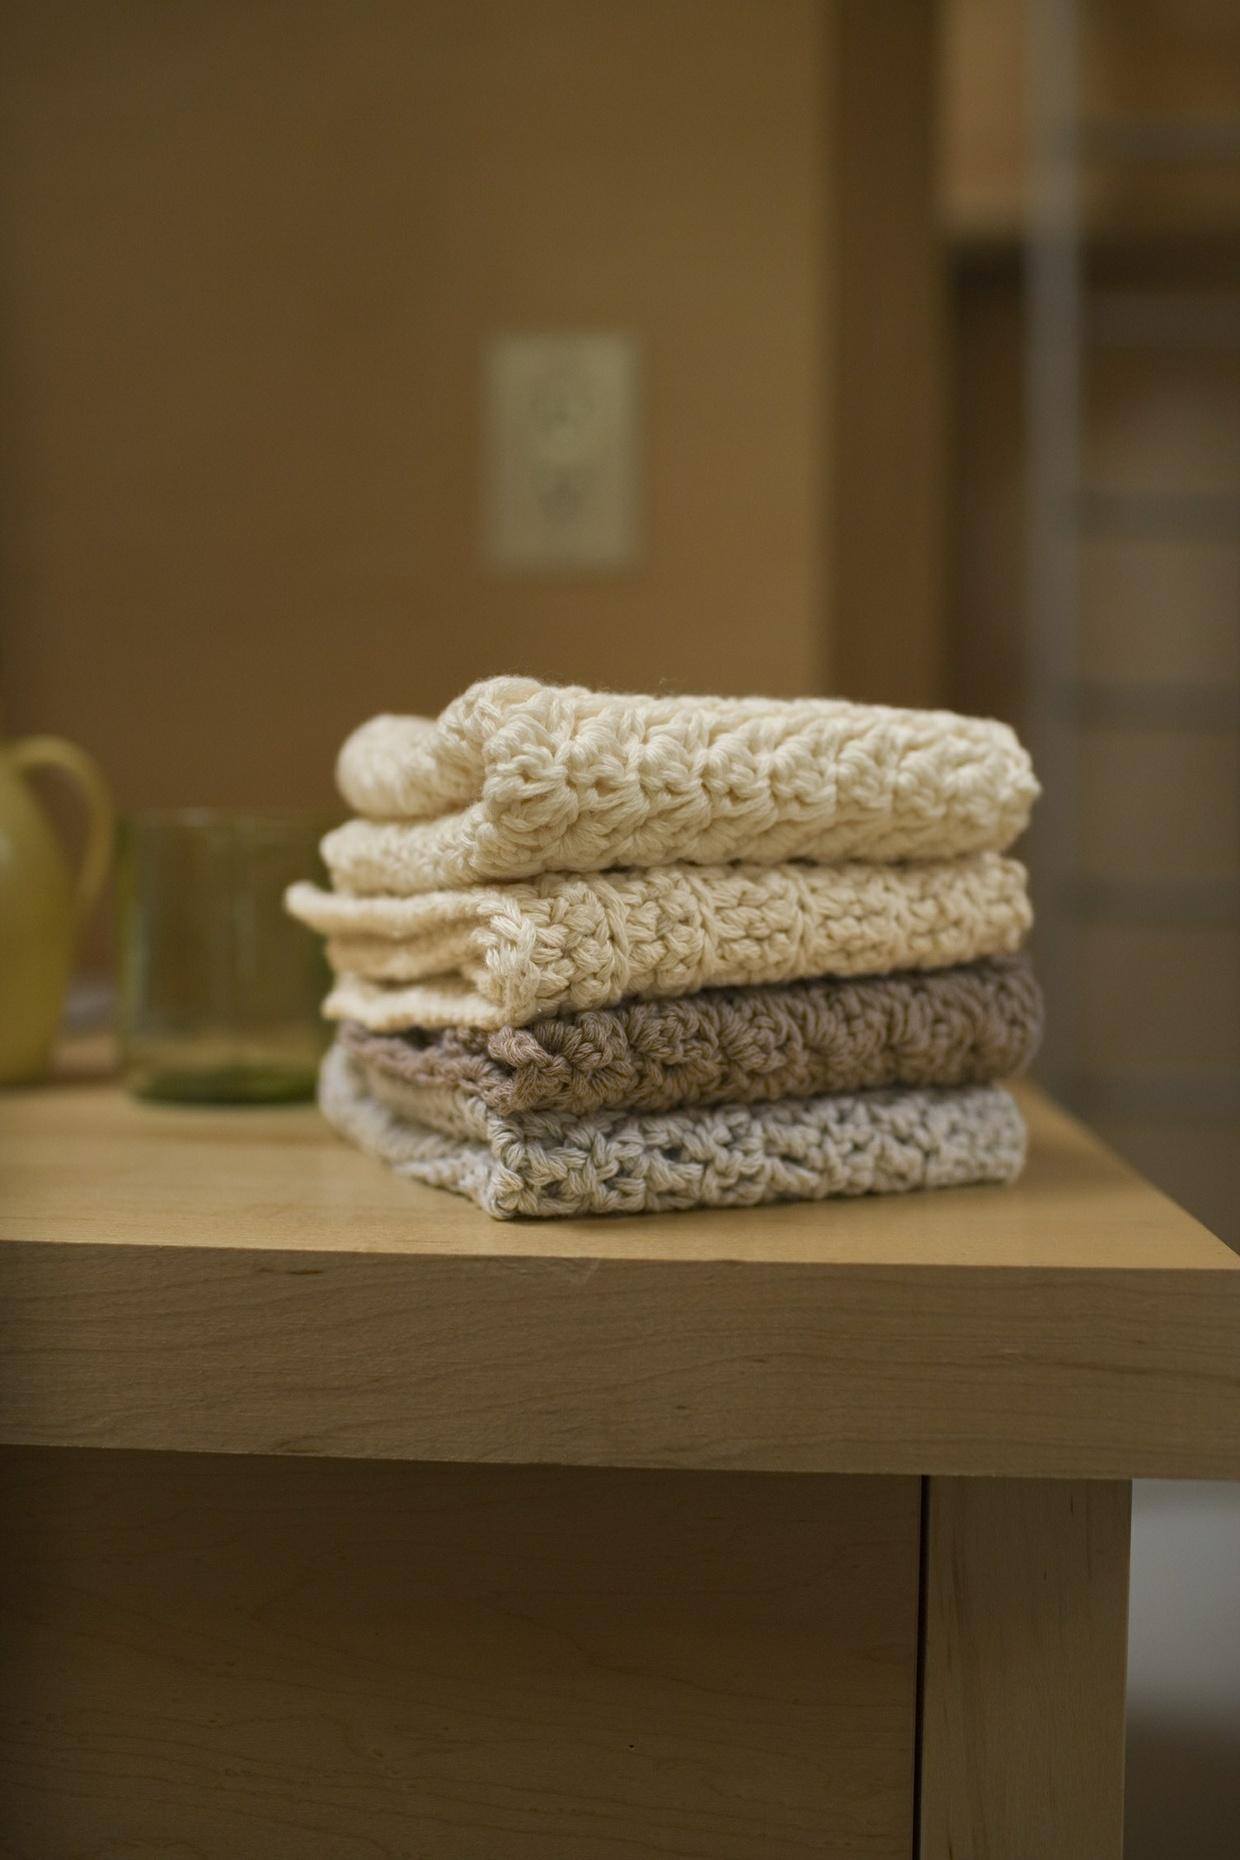 Crochet Pack of 4 Washcloths